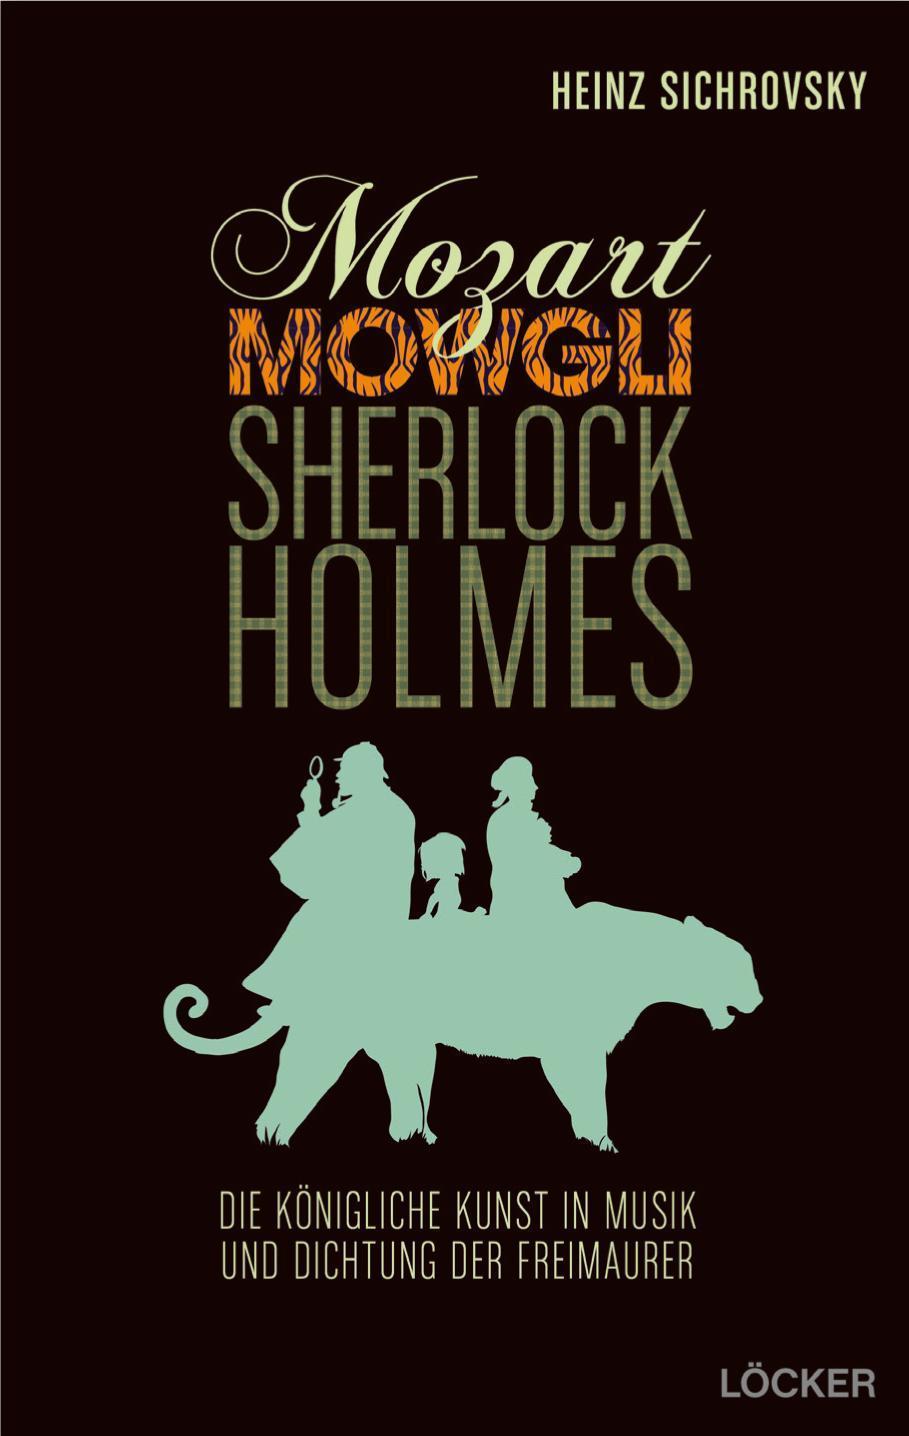 Mozart, Mowgli, Sherlock Holmes Heinz Sichrovsky